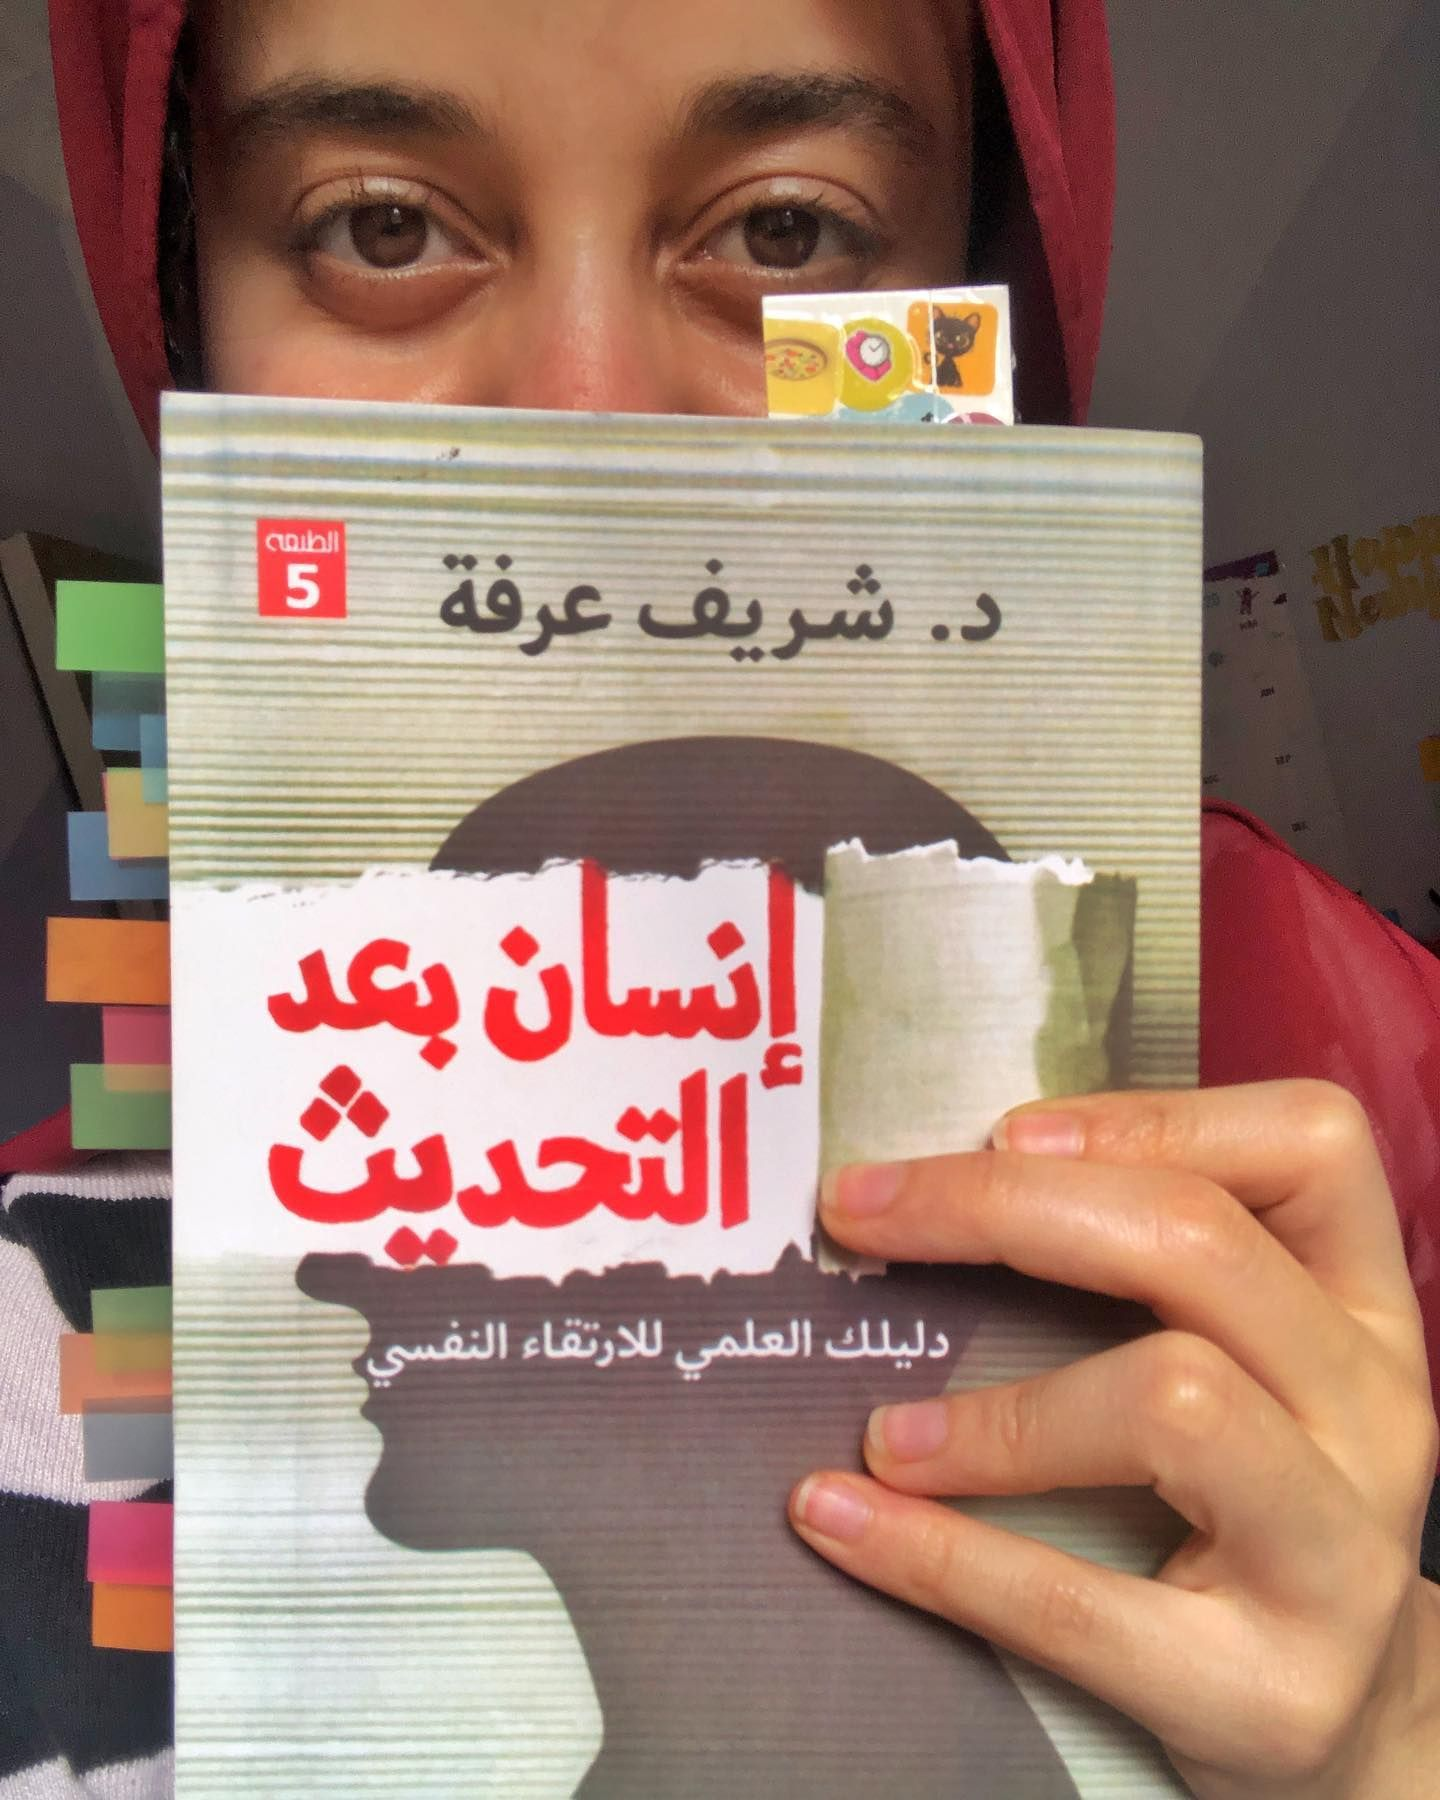 كتاب إنسان بعد التحديث Arabic Books Book Names Book Worms